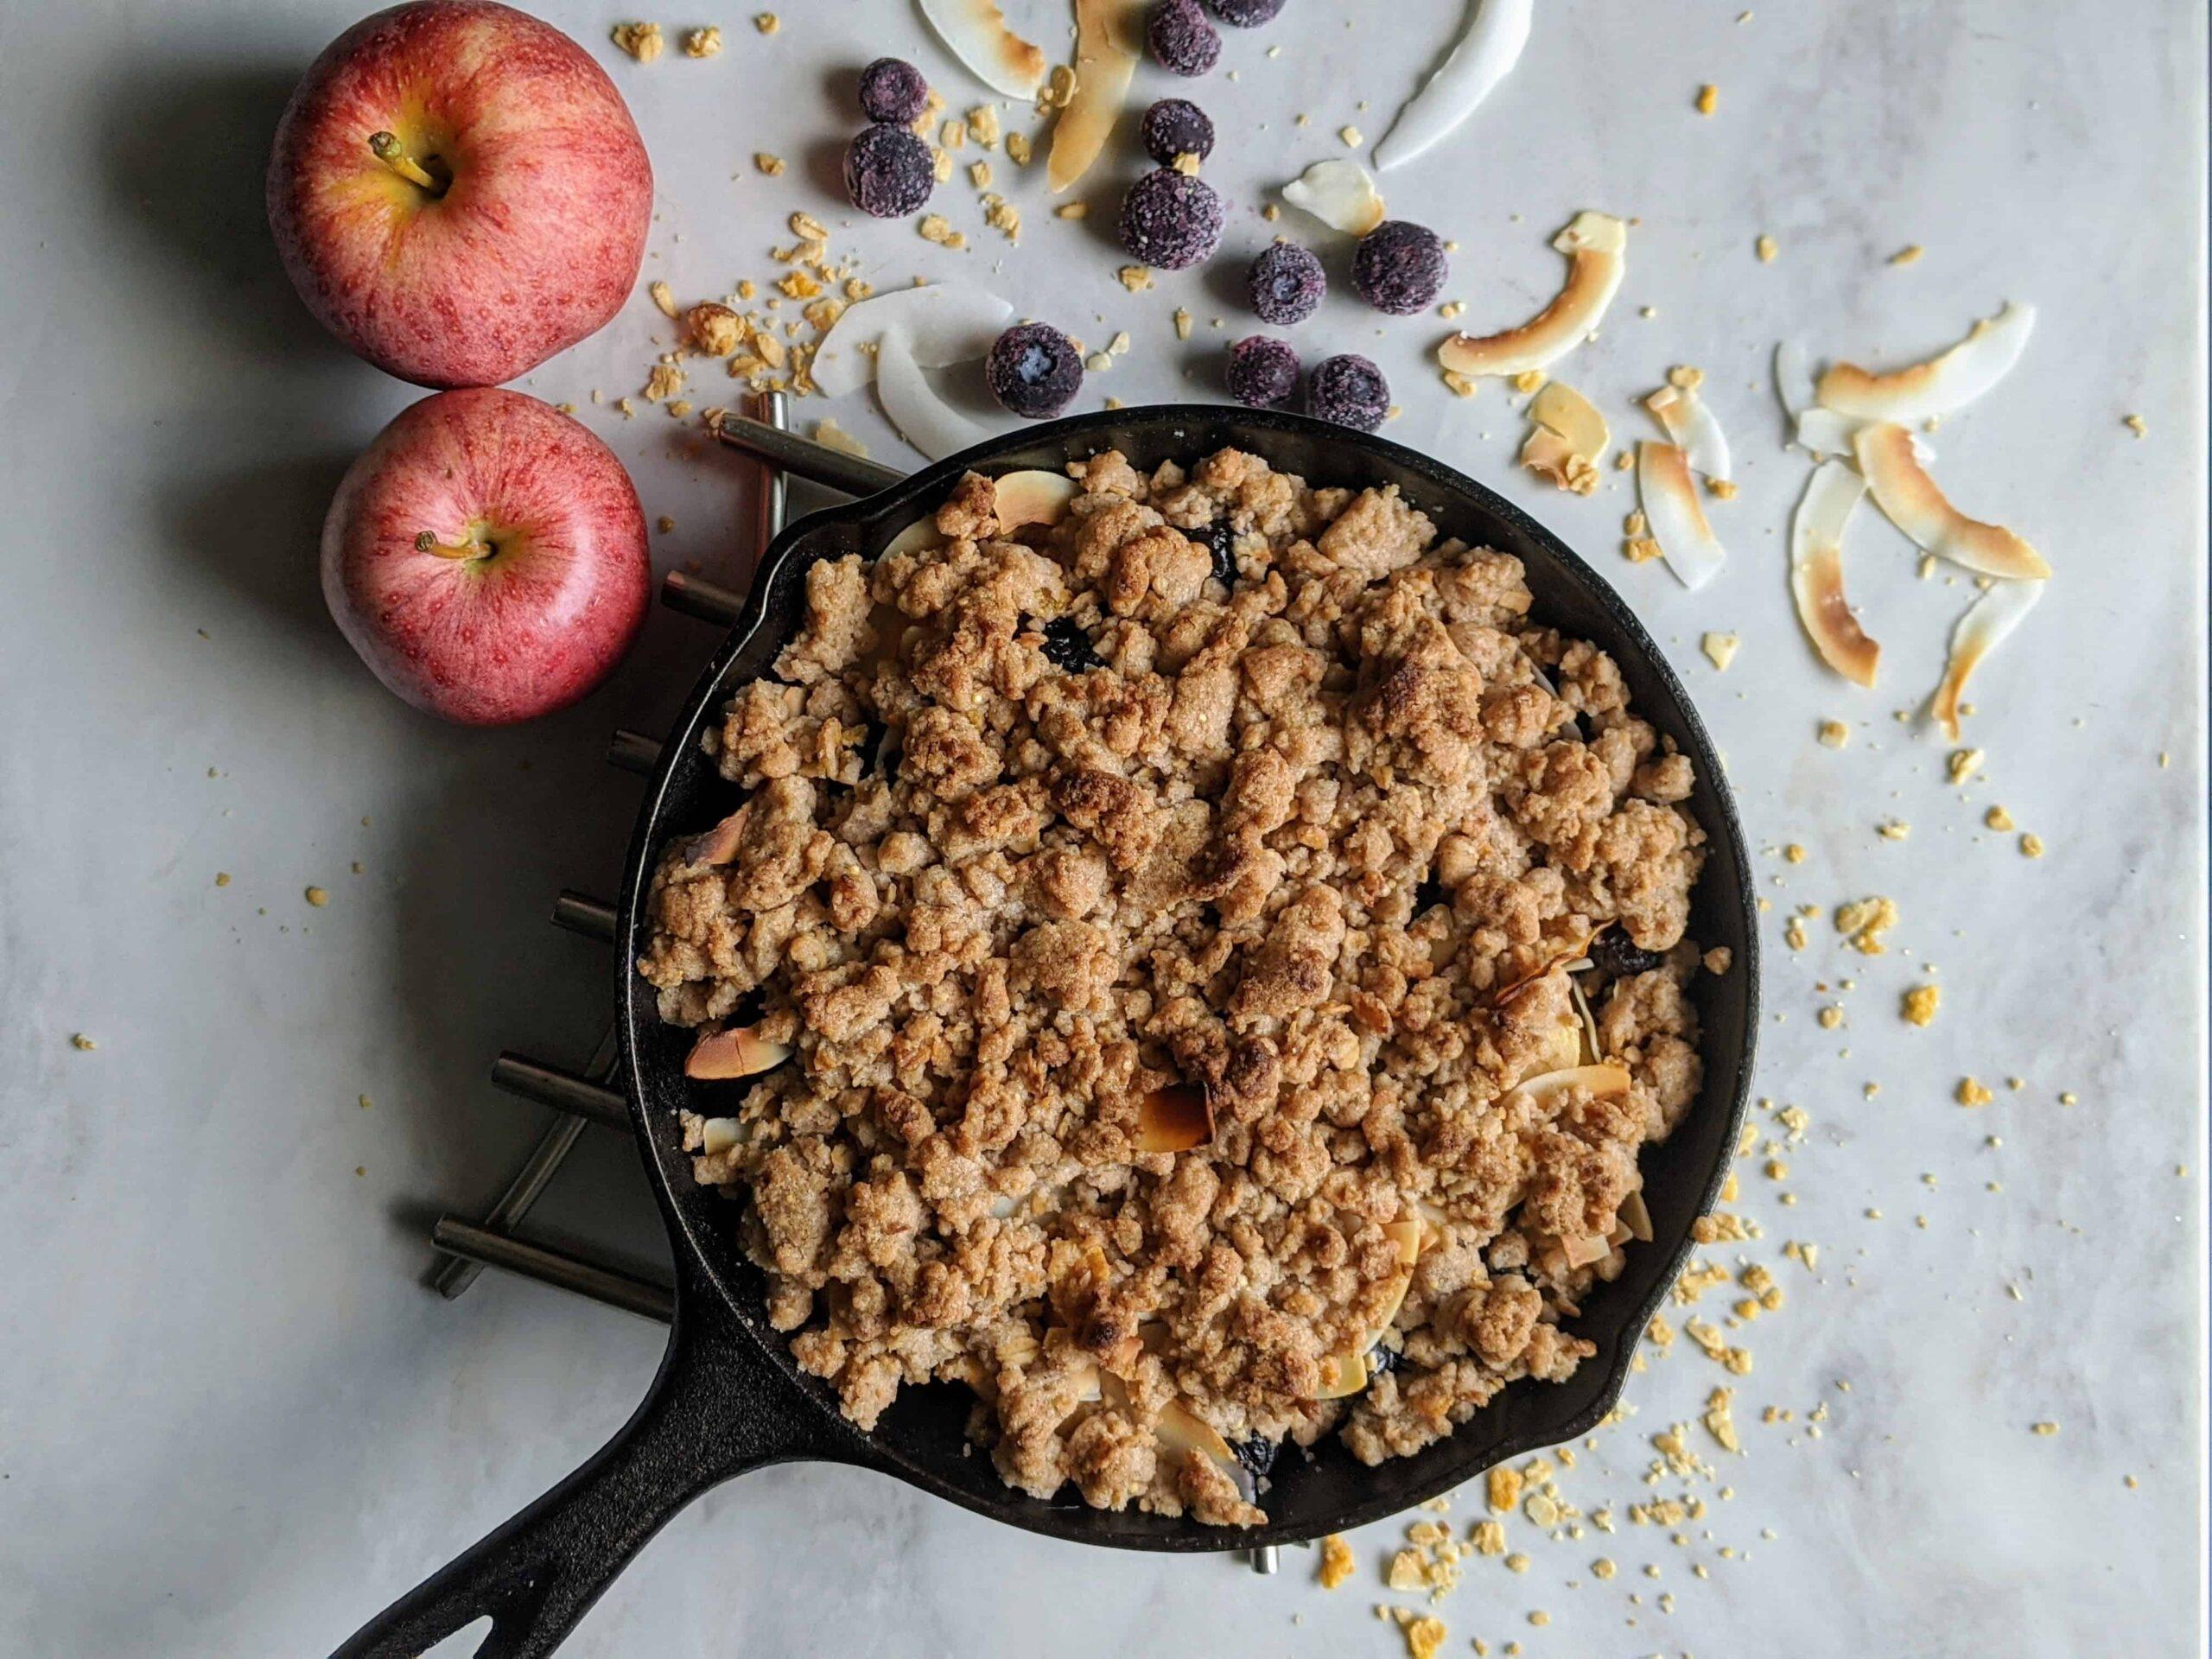 Coconut Crunch Blueberrry Spple Crisp in a cast iron pan